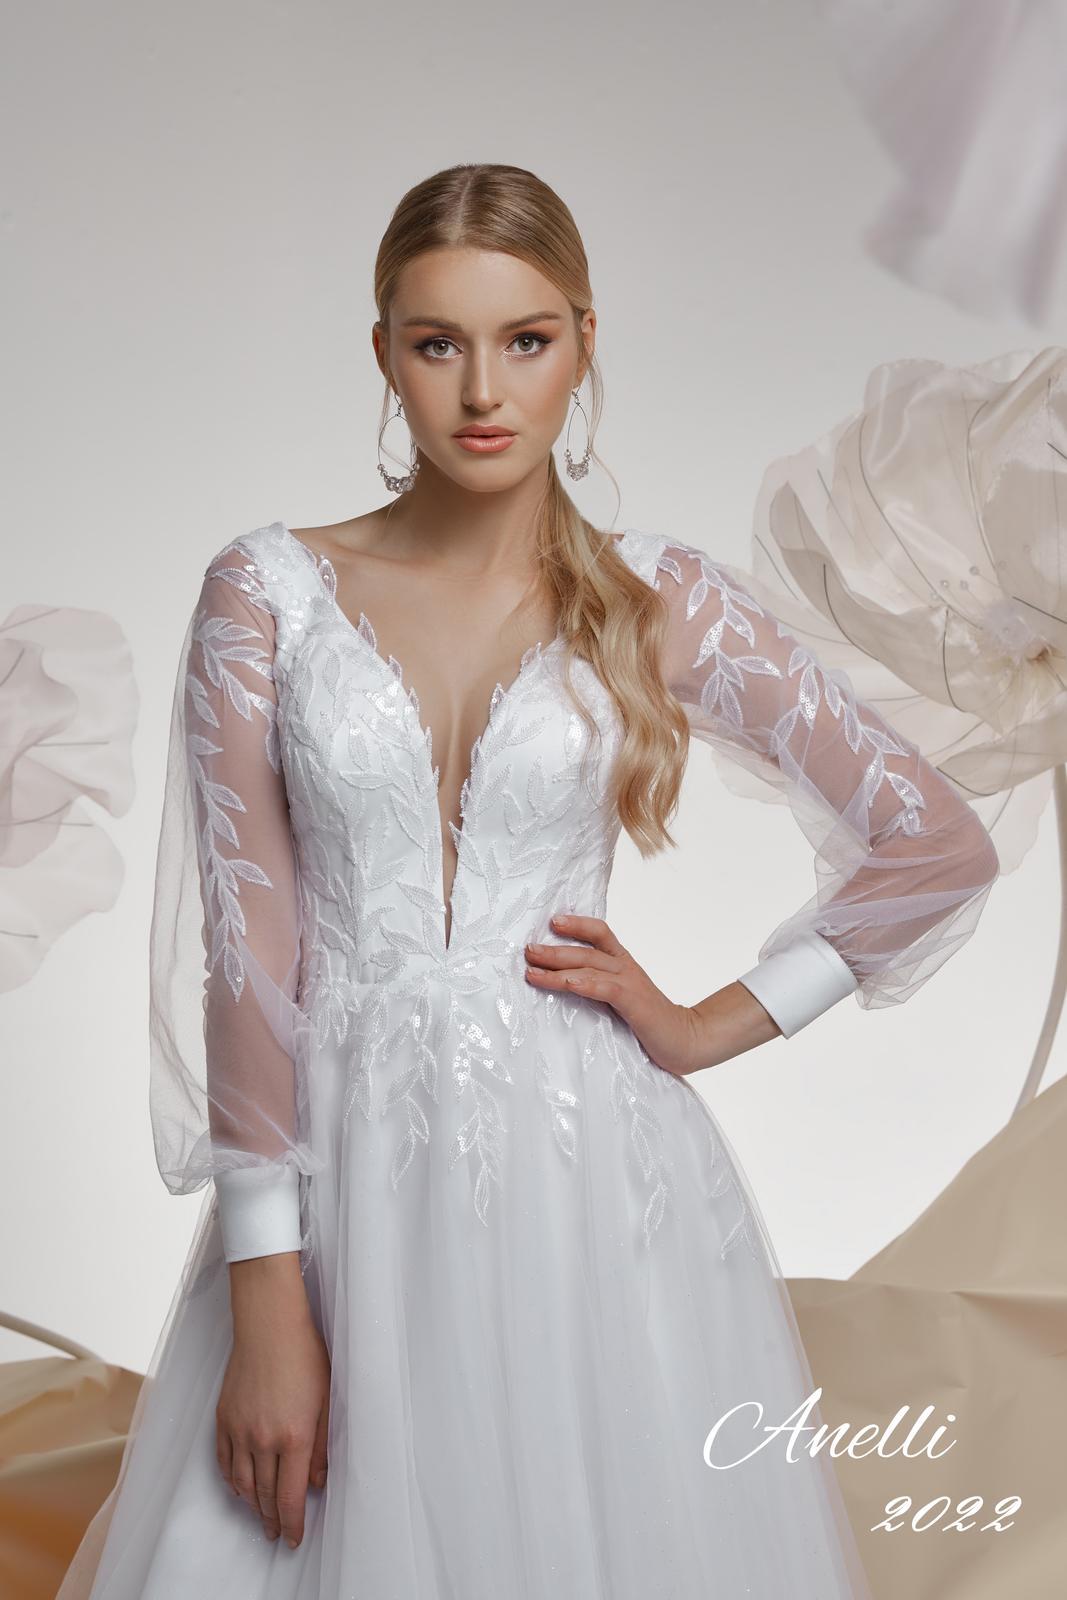 Svadobné šaty - Imagine 2022 - Obrázok č. 3